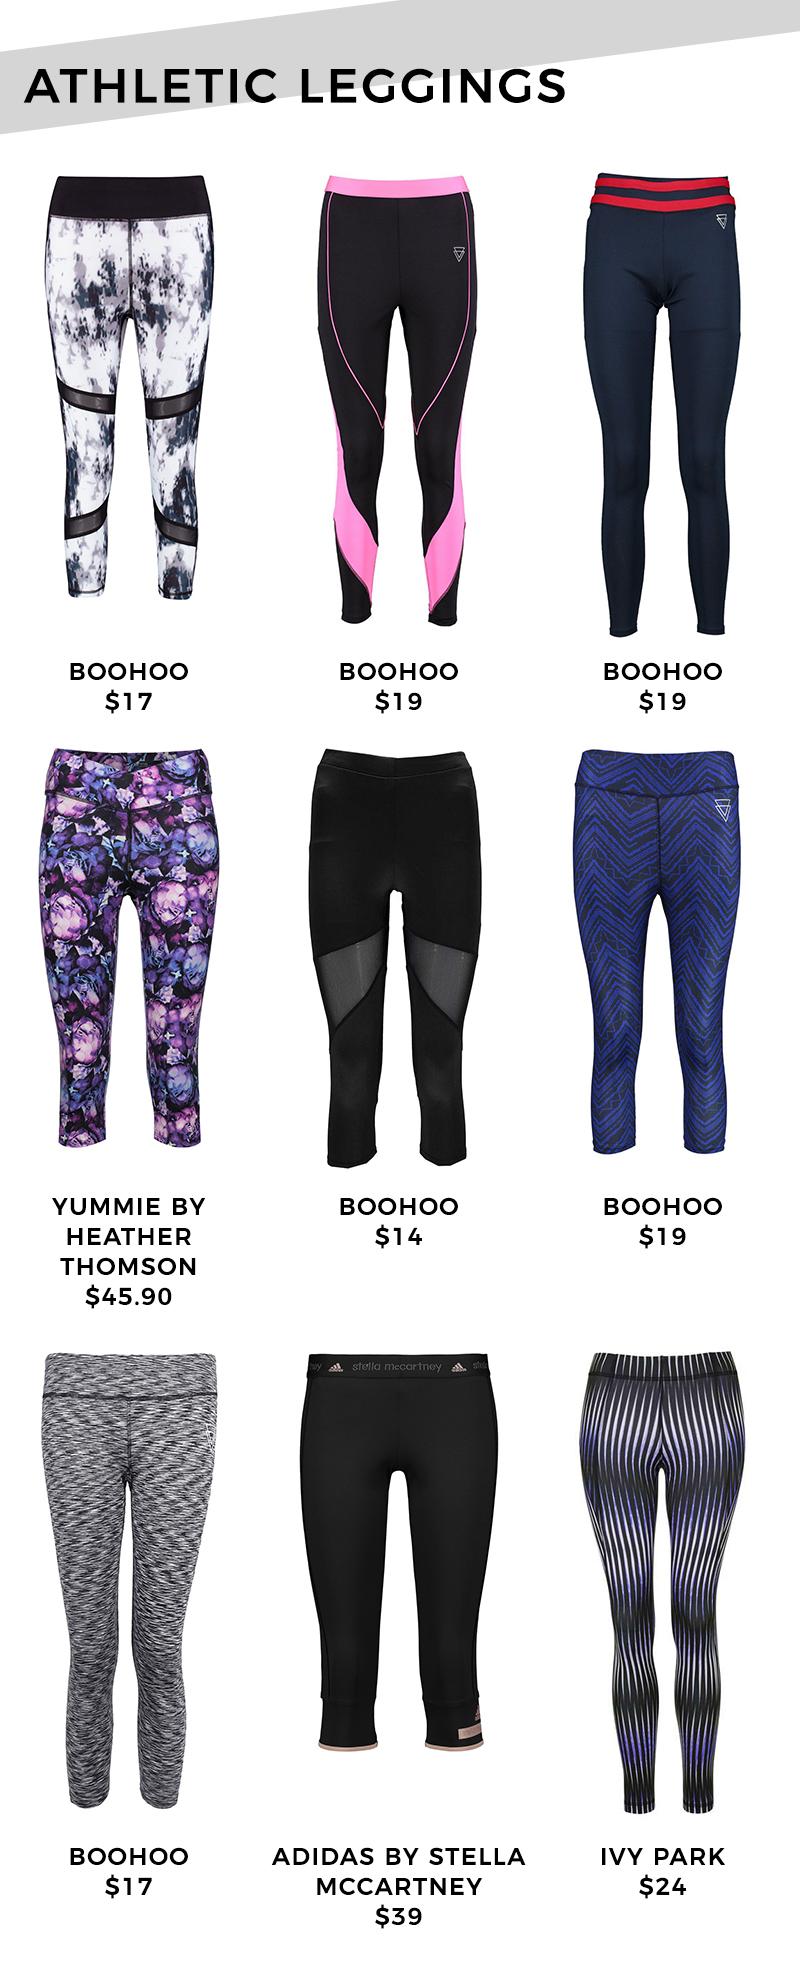 Athletic leggings under $50.